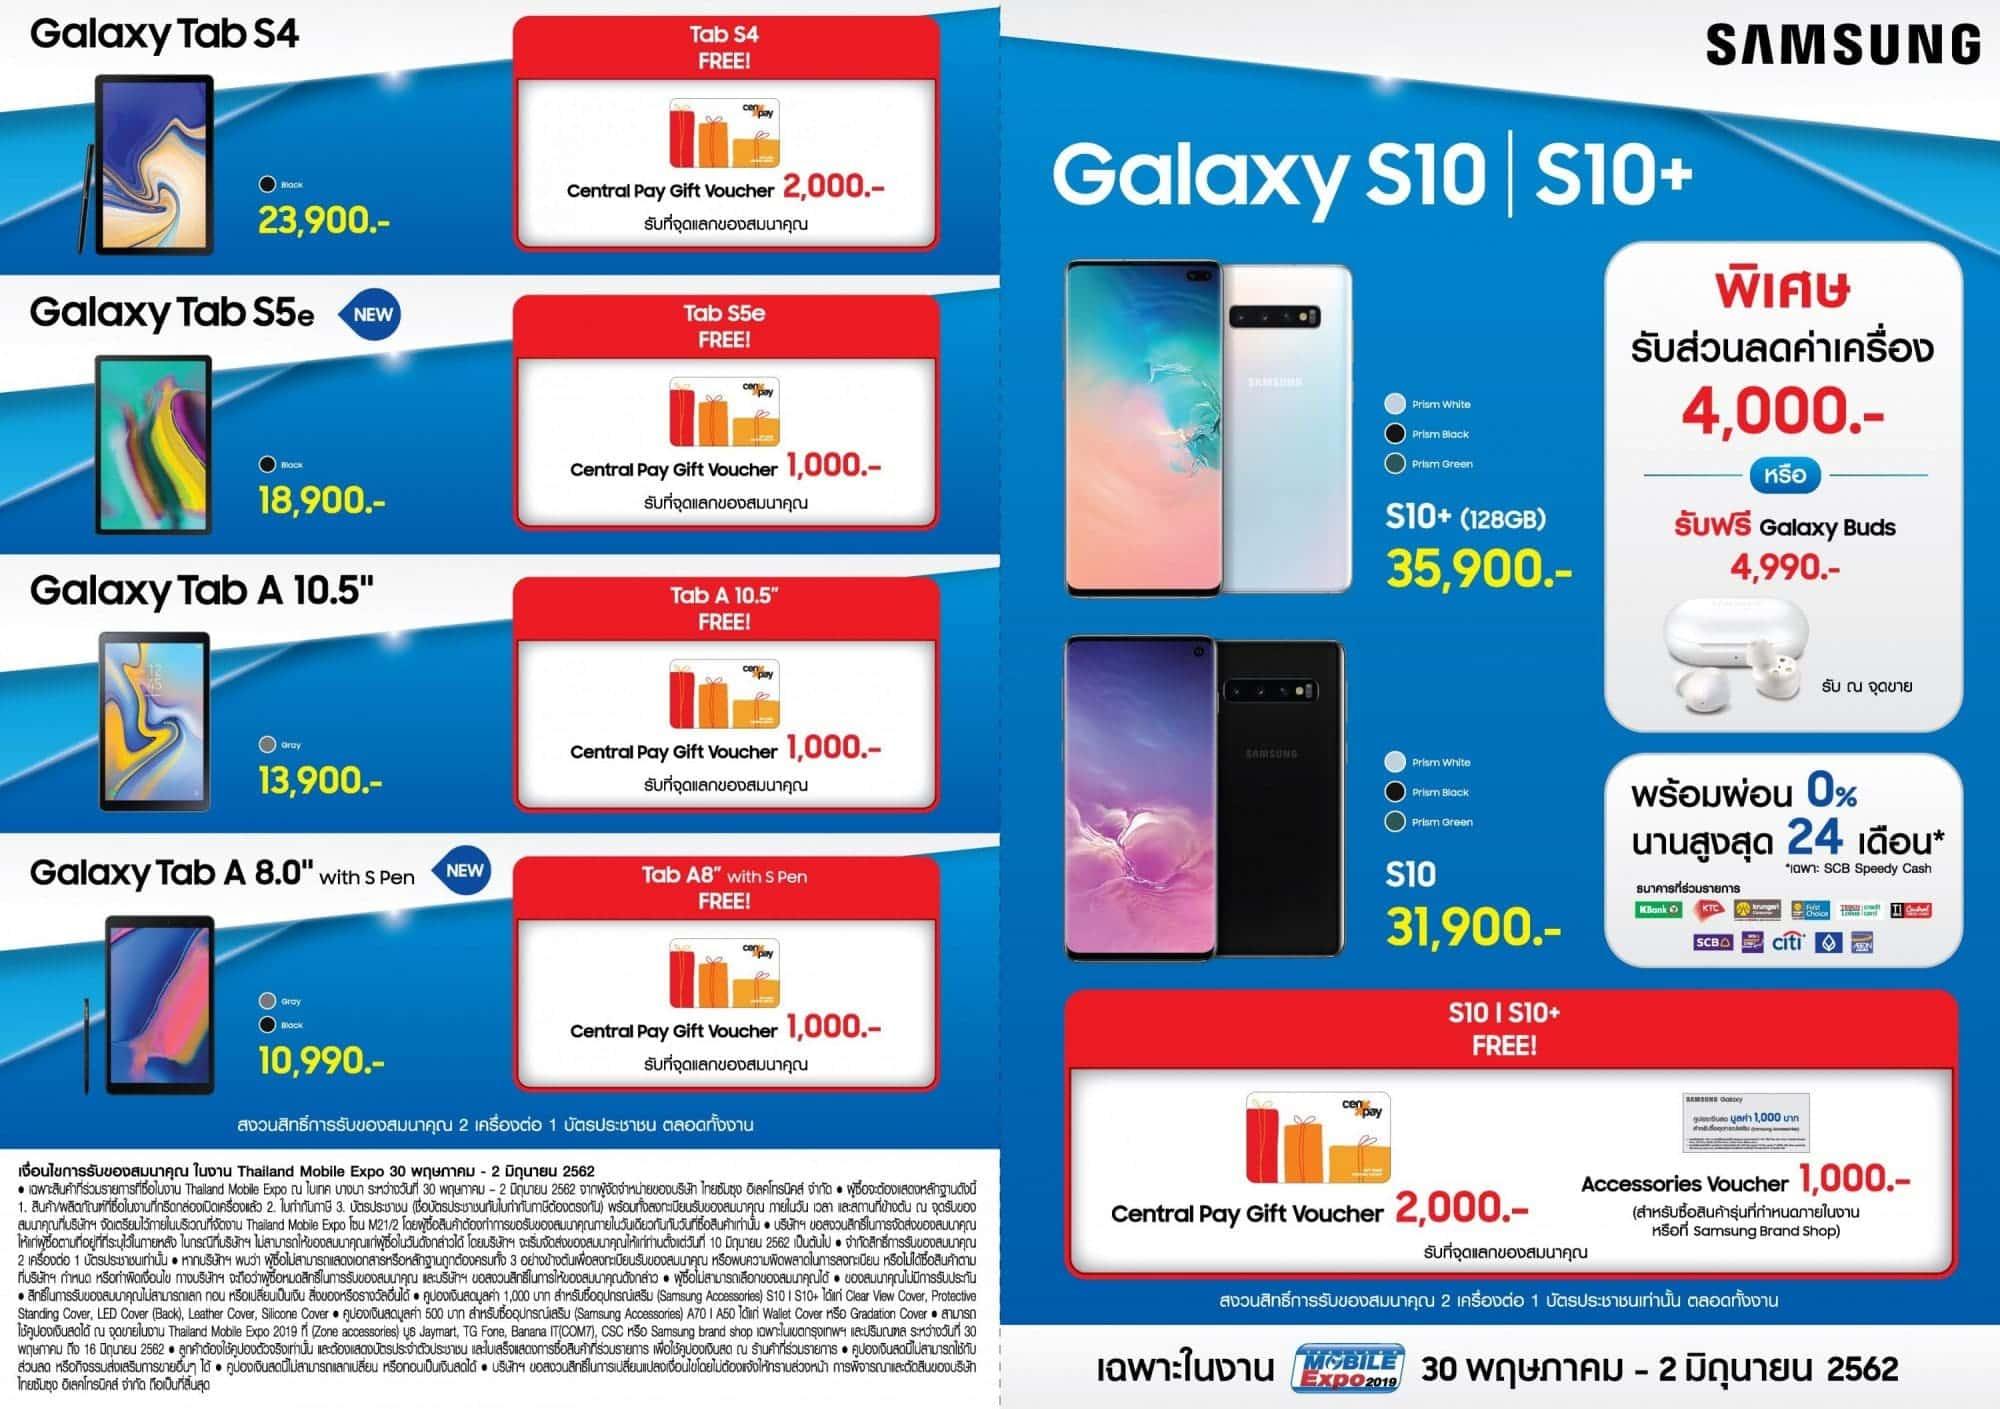 Samsung ส่งมอบความพิเศษสุดยิ่งใหญ่ในงาน Thailand Mobile Expo 2019 - Samsung ส่งมอบความพิเศษสุดยิ่งใหญ่ในงาน Thailand Mobile Expo 2019